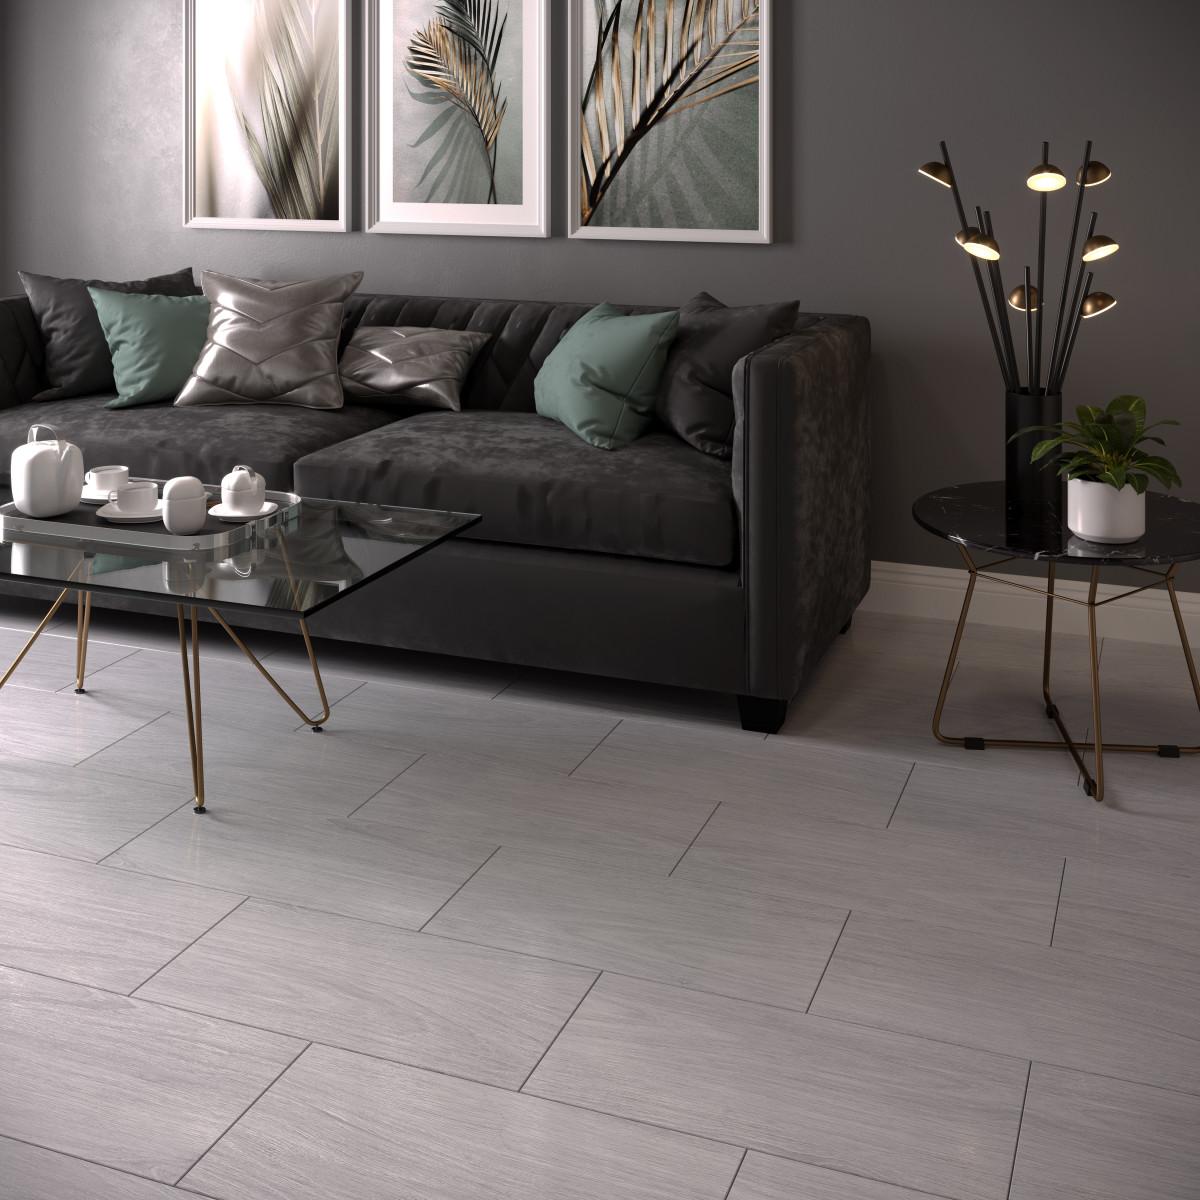 Керамогранит Legno 30х60 см 1.44 м² цвет серый